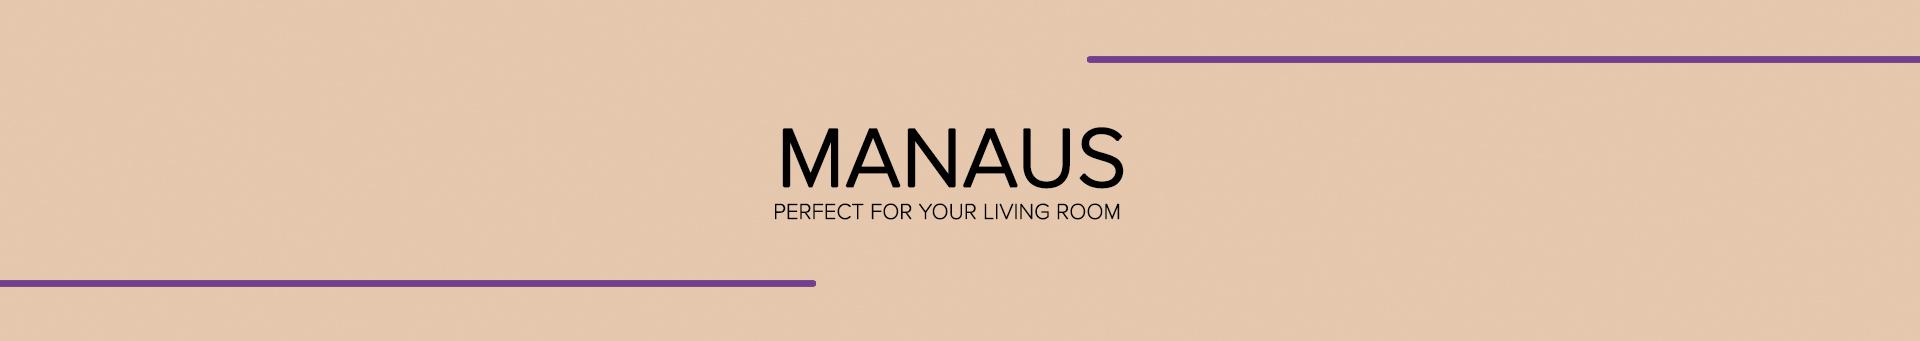 Manaus Entertainment center